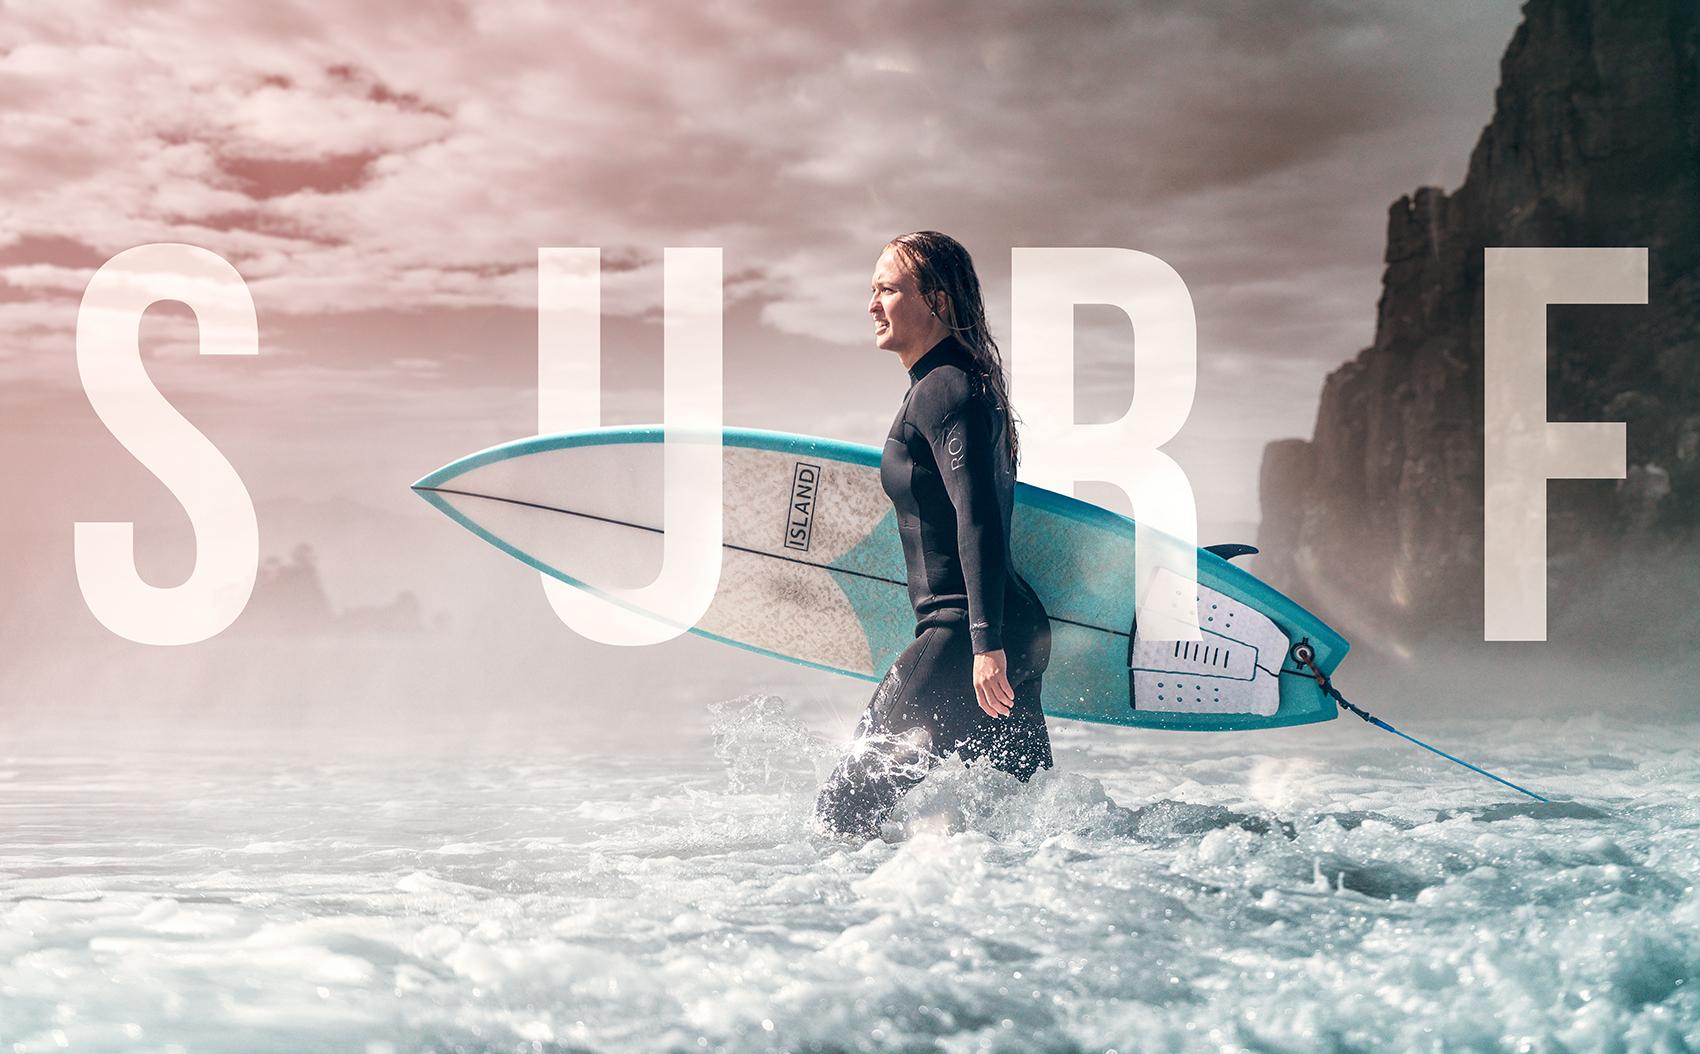 <small>New Zealand surfer Freya Bullock.</small>